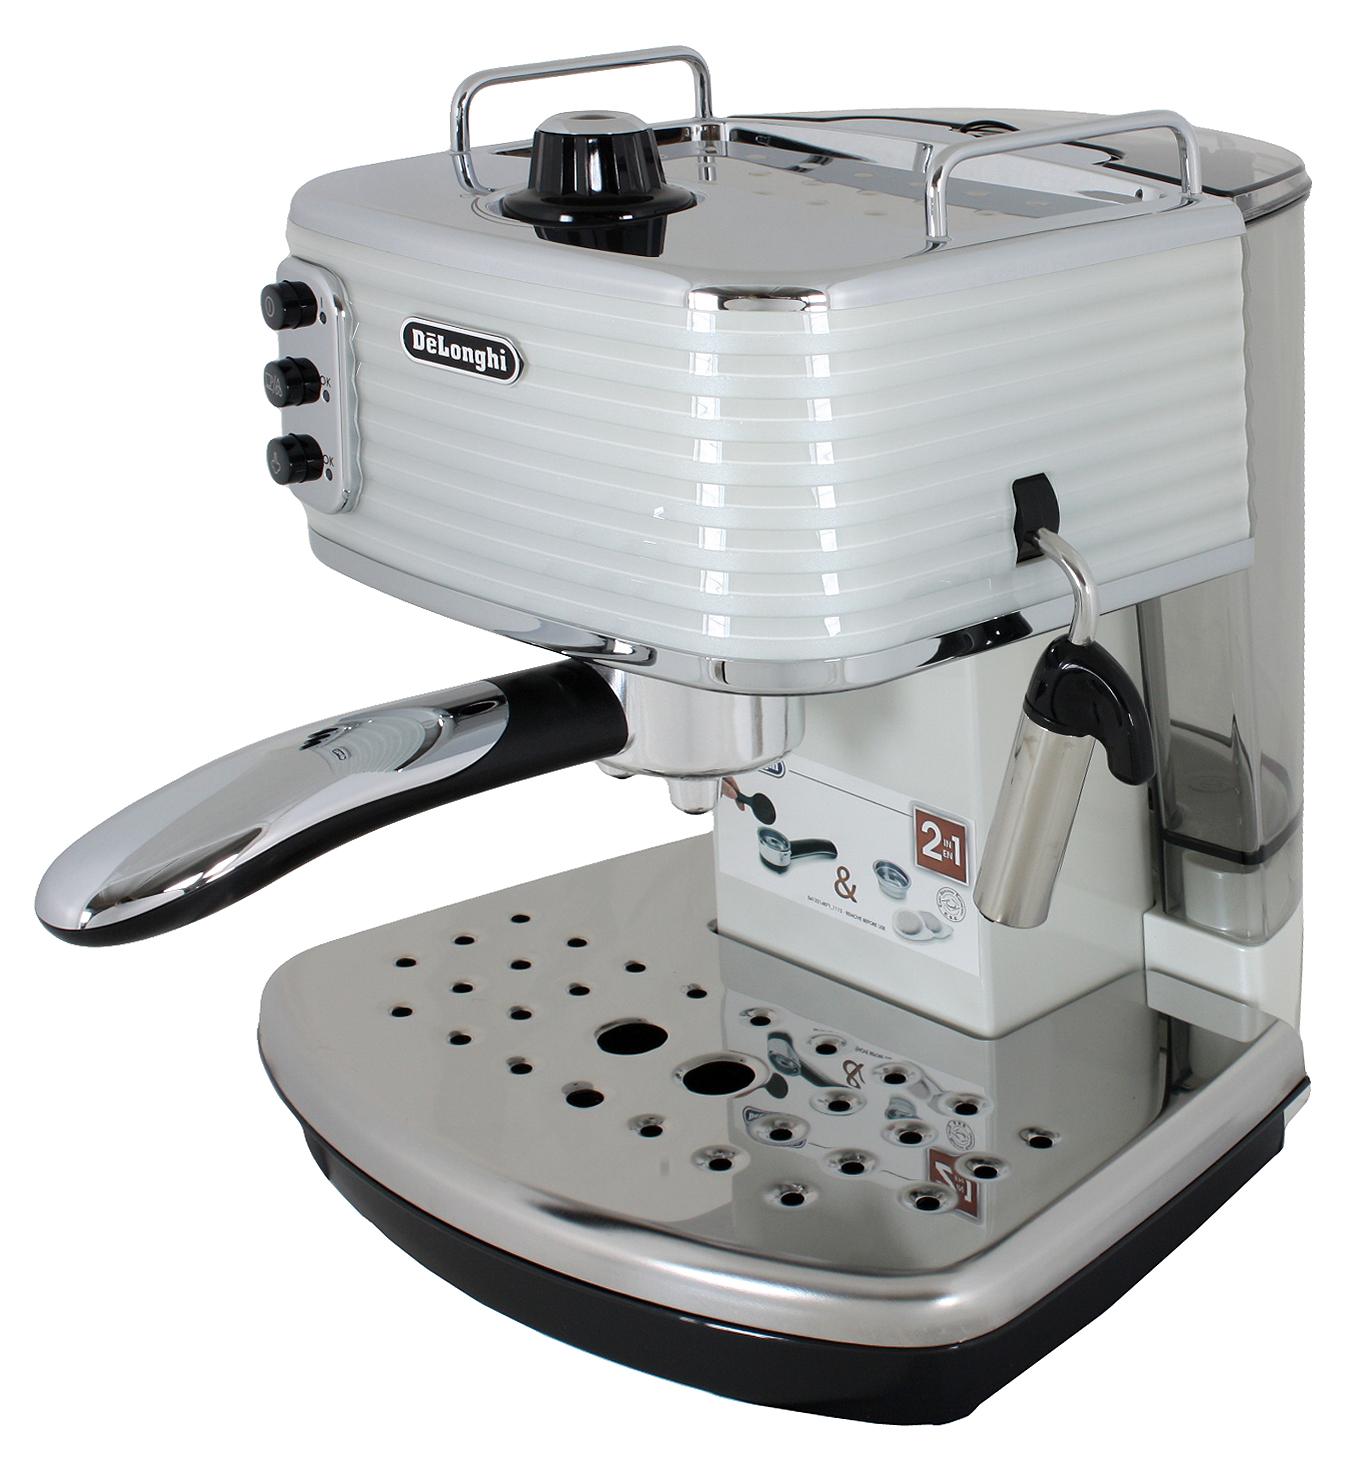 delonghi ecz351w scultura espressomaschine siebtr ger wei ebay. Black Bedroom Furniture Sets. Home Design Ideas